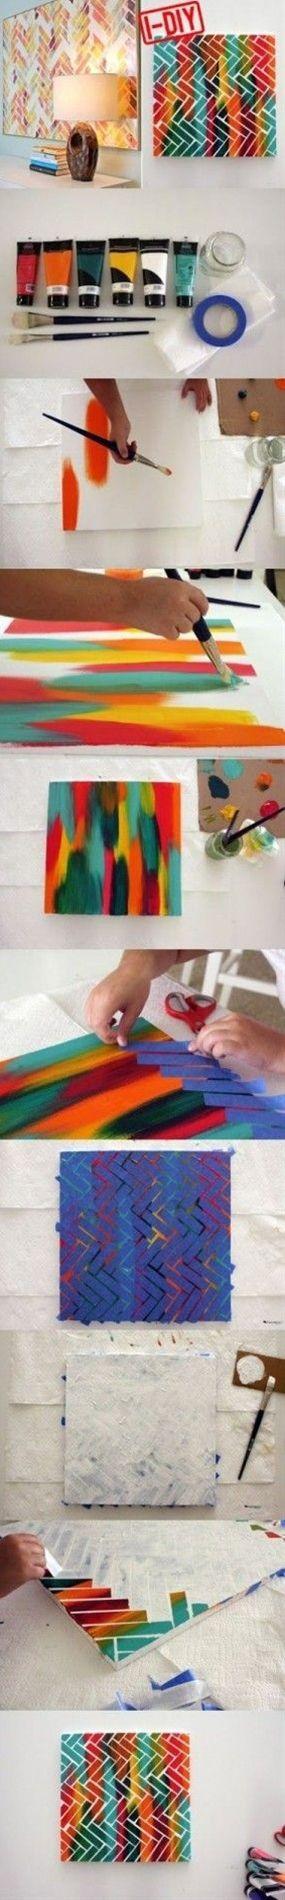 DIY canvas painting.